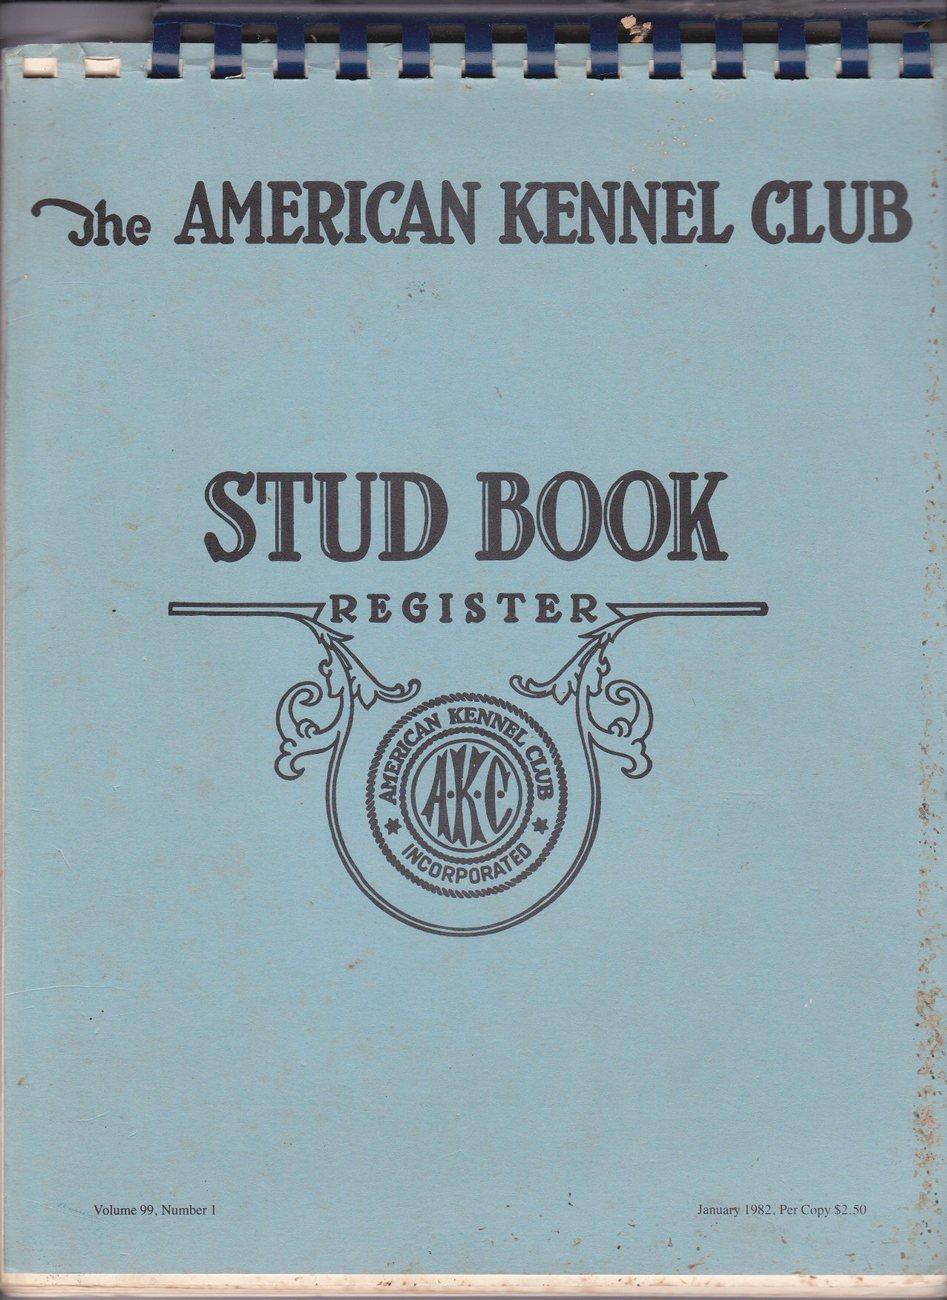 AKC Stud Book Register Volume 99, Number 1 - January 1982